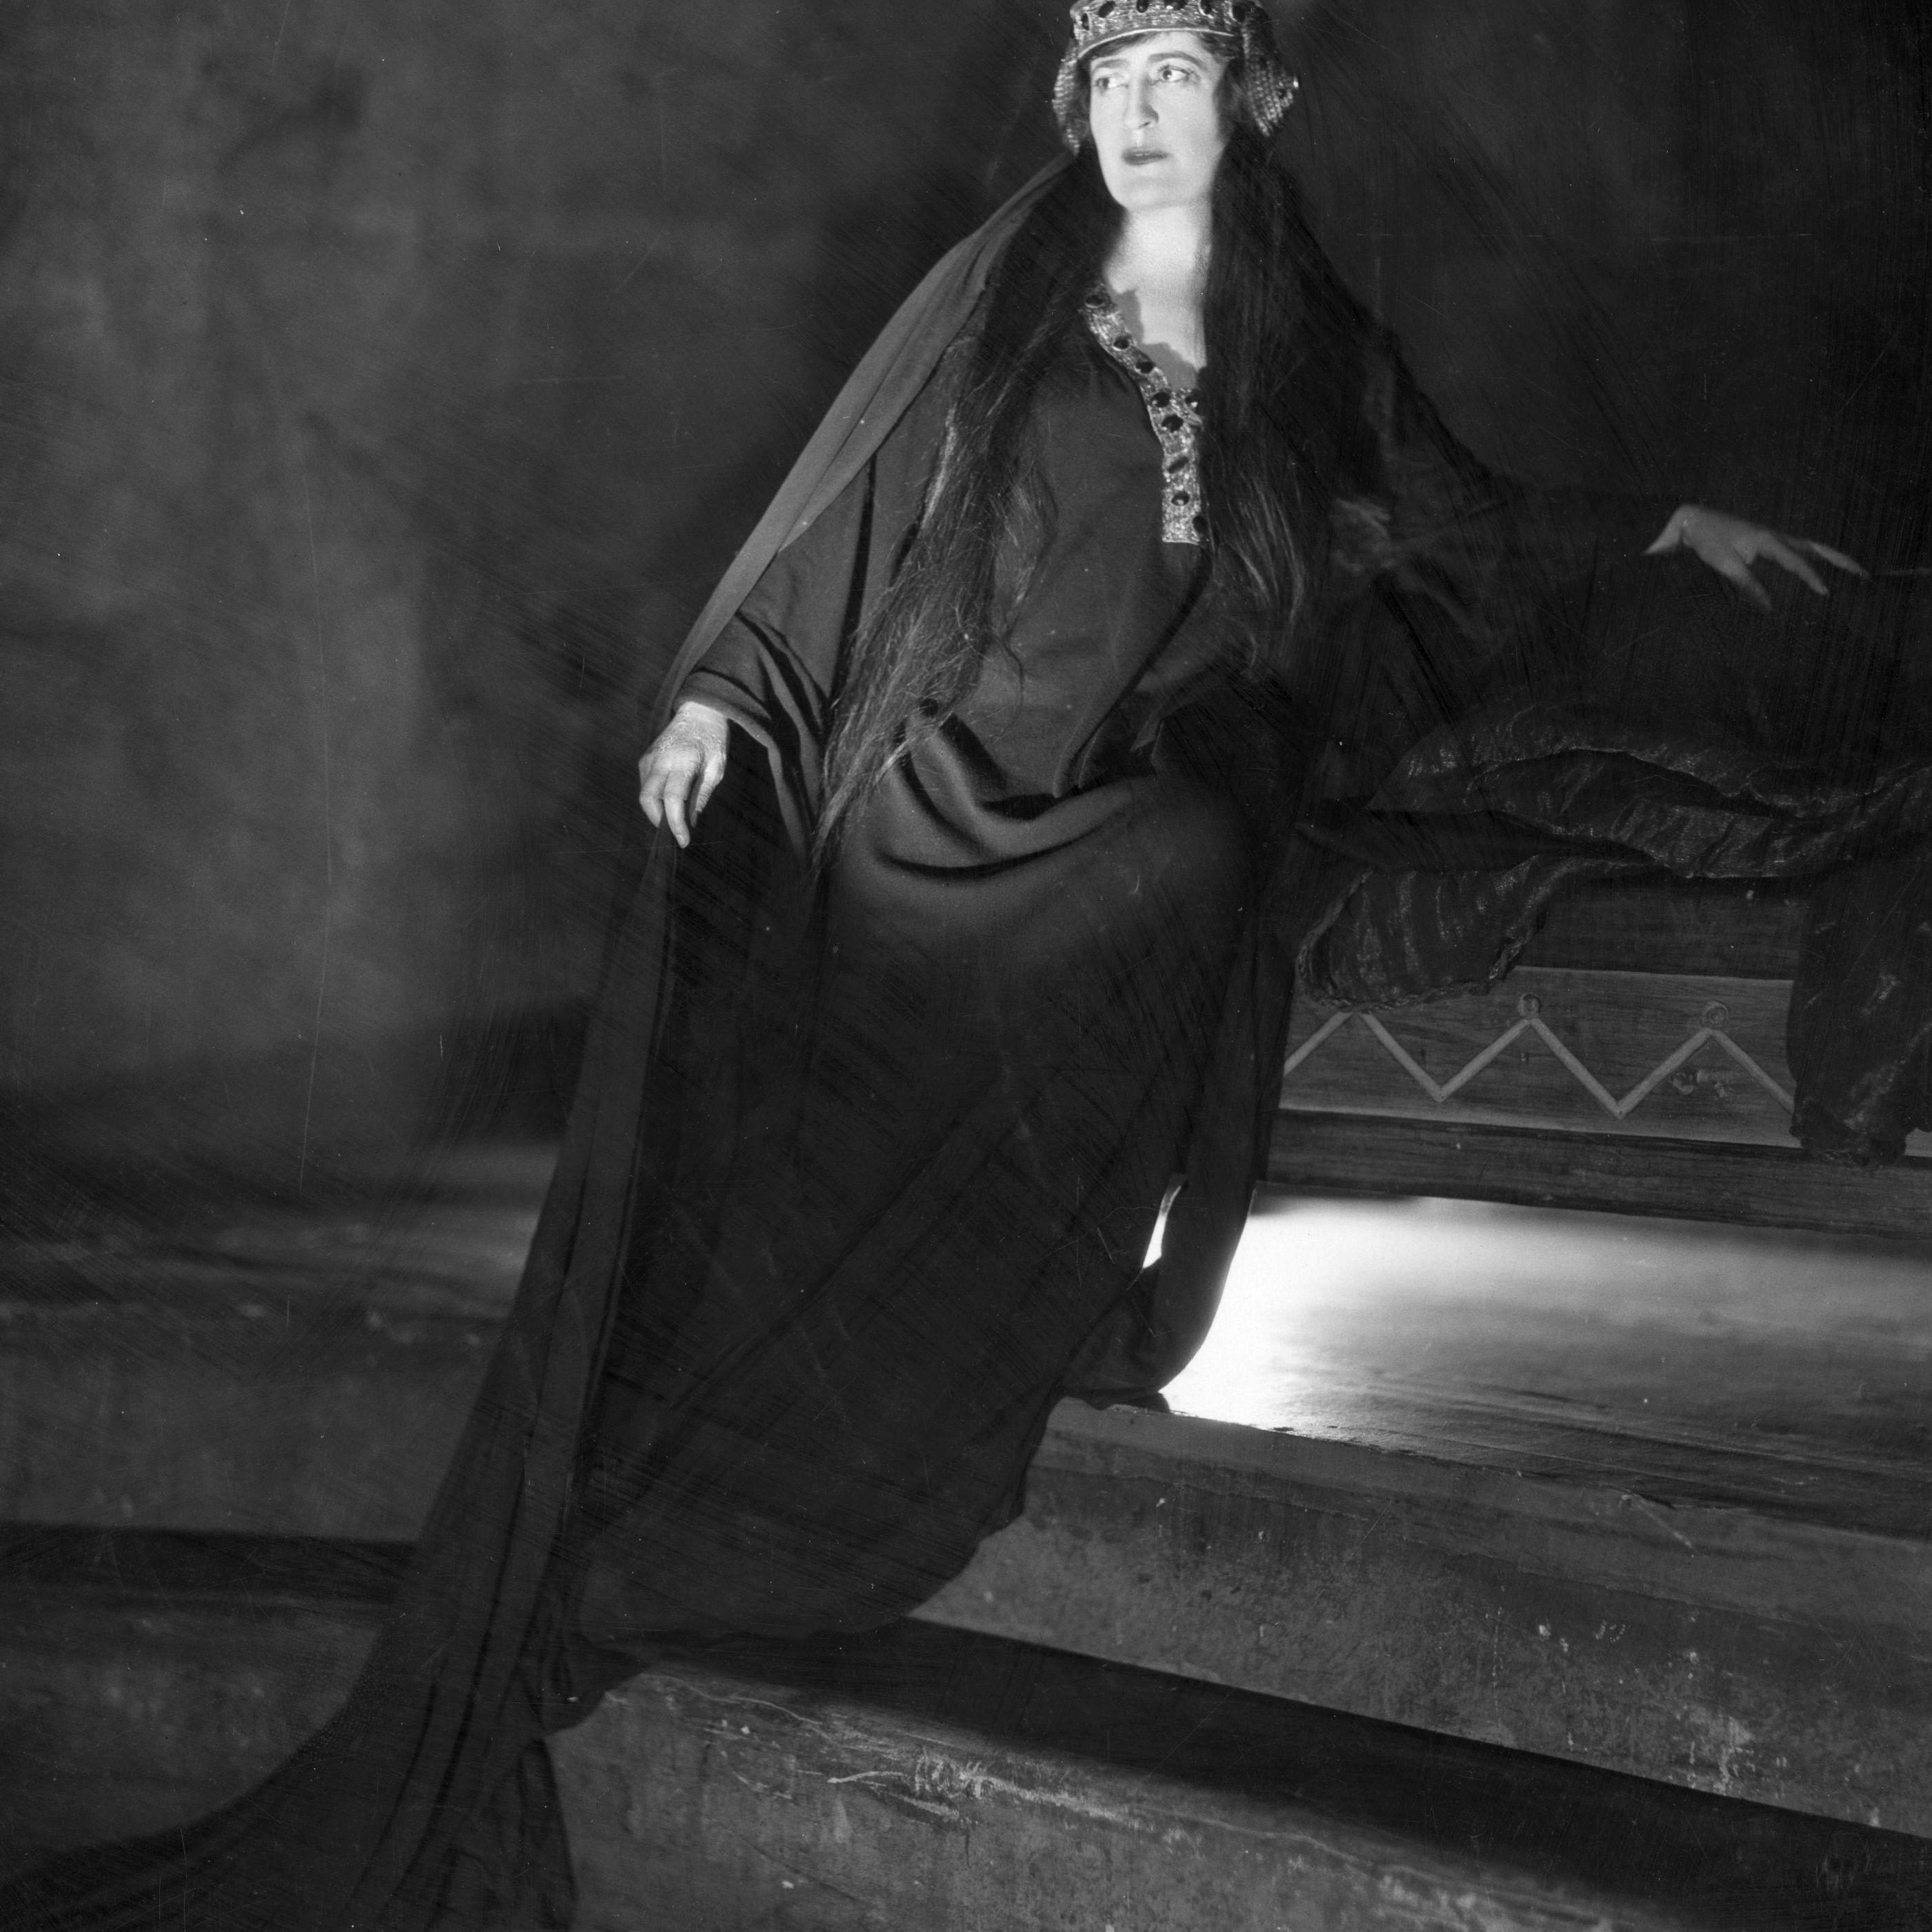 a feminist analysis of shakespeare s hamlet